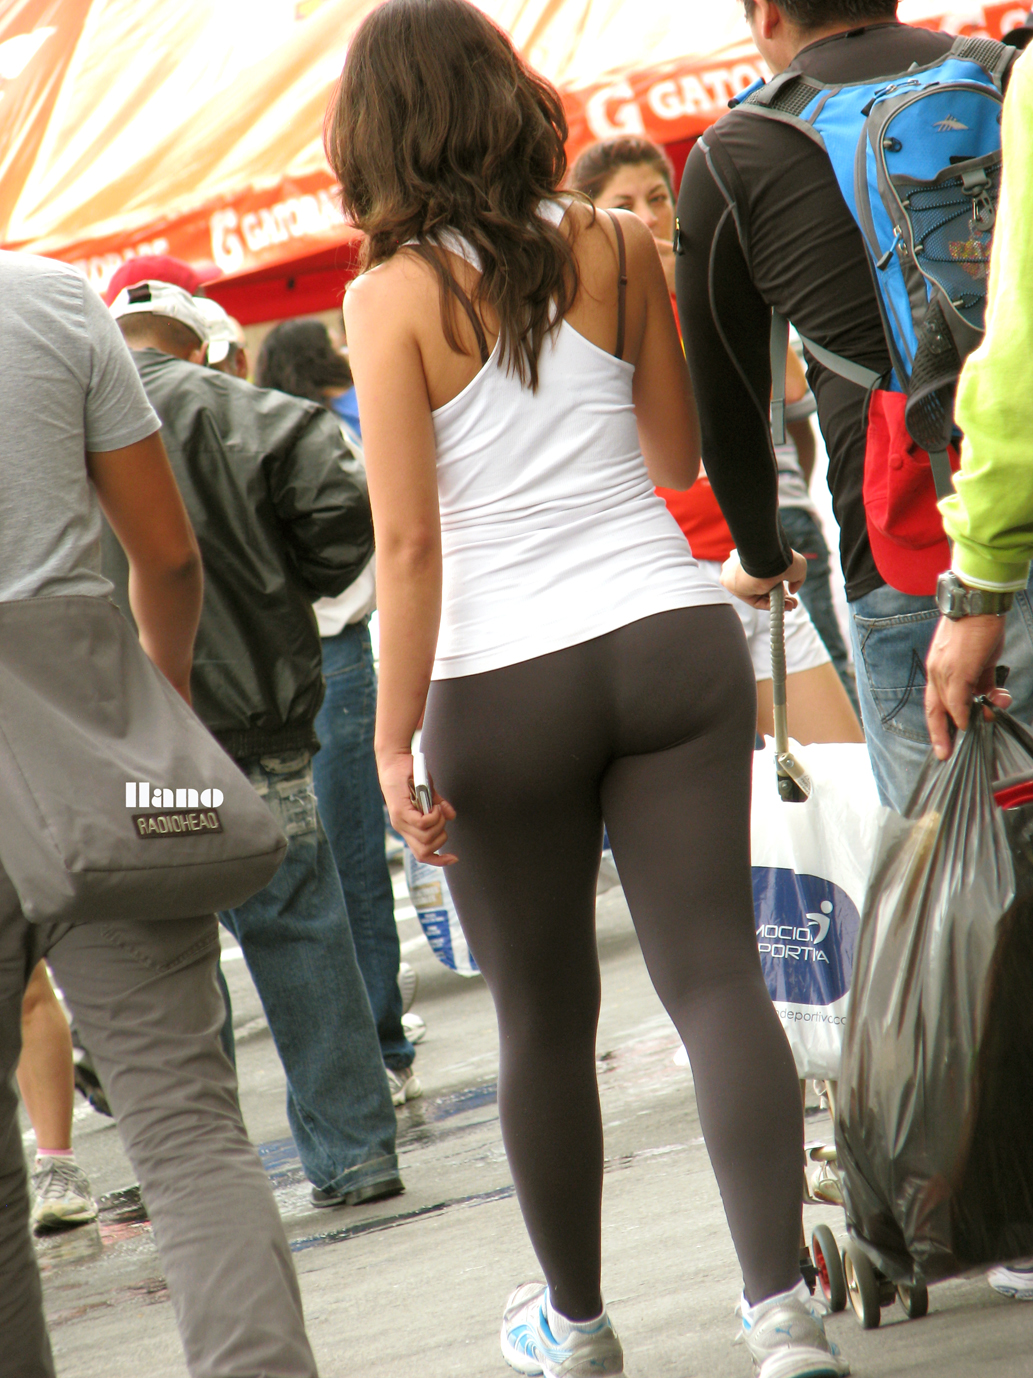 Hot ass from behind